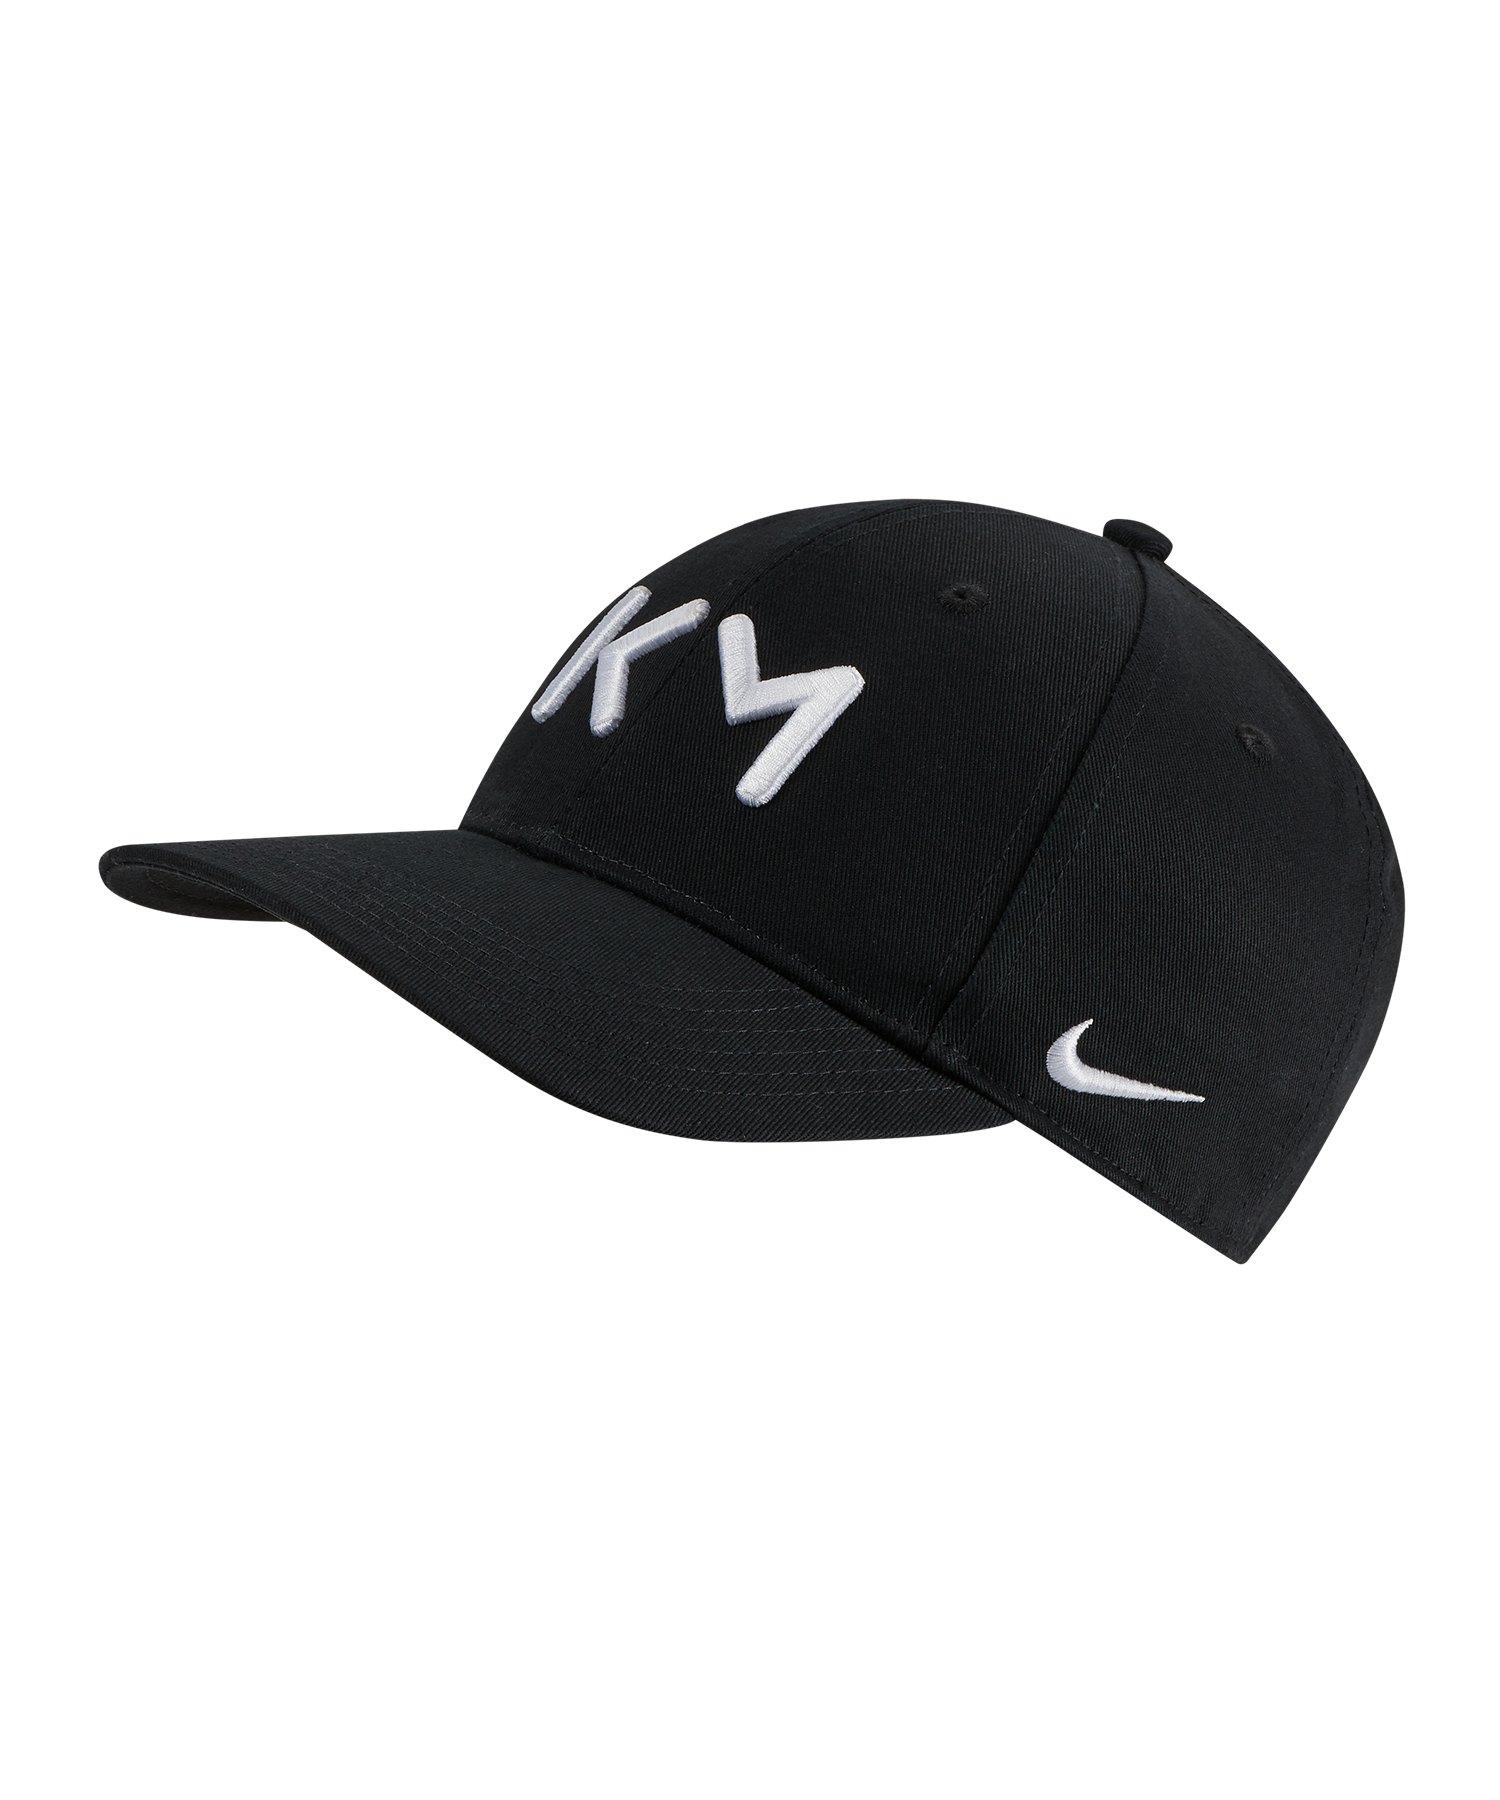 Nike Kylian Mbappe Legacy 91 Cap Kappe Kids F010 - schwarz